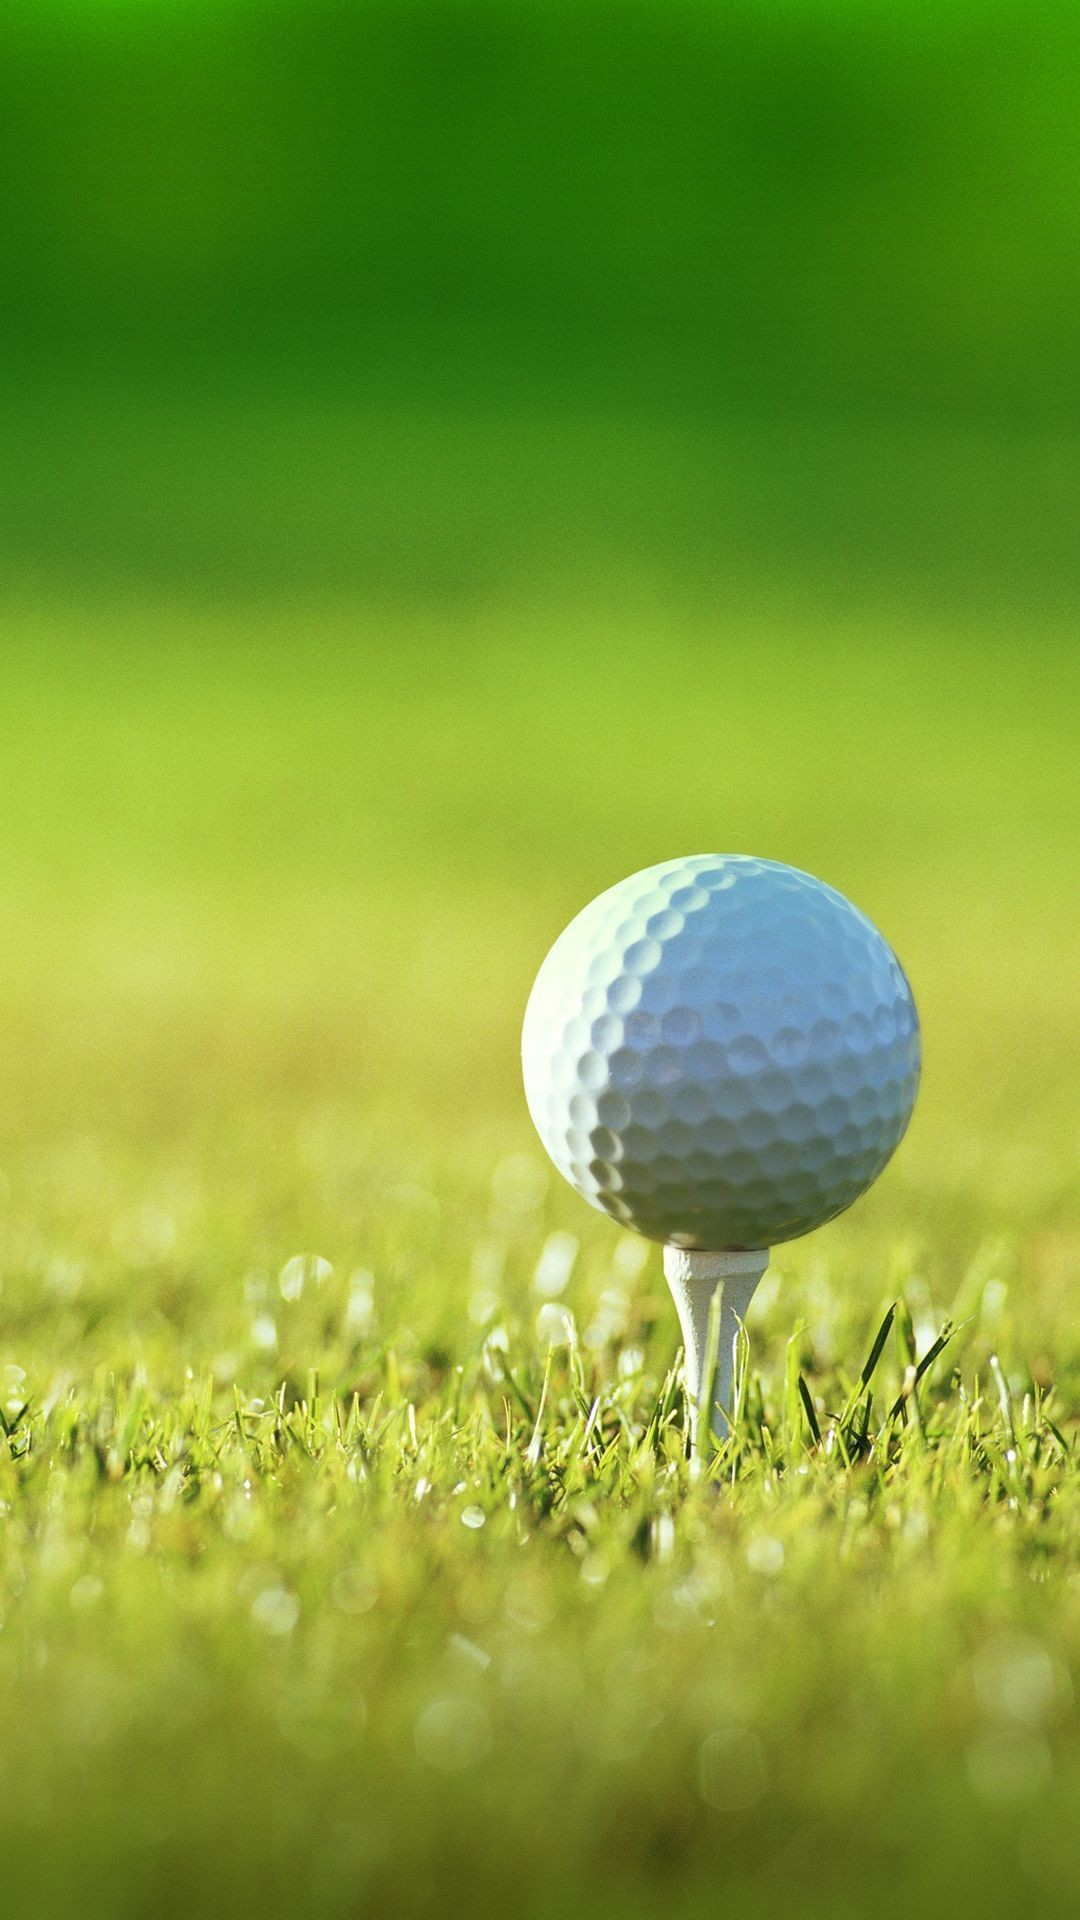 Nike golf wallpaper wallpapertag - Golf wallpaper hd ...